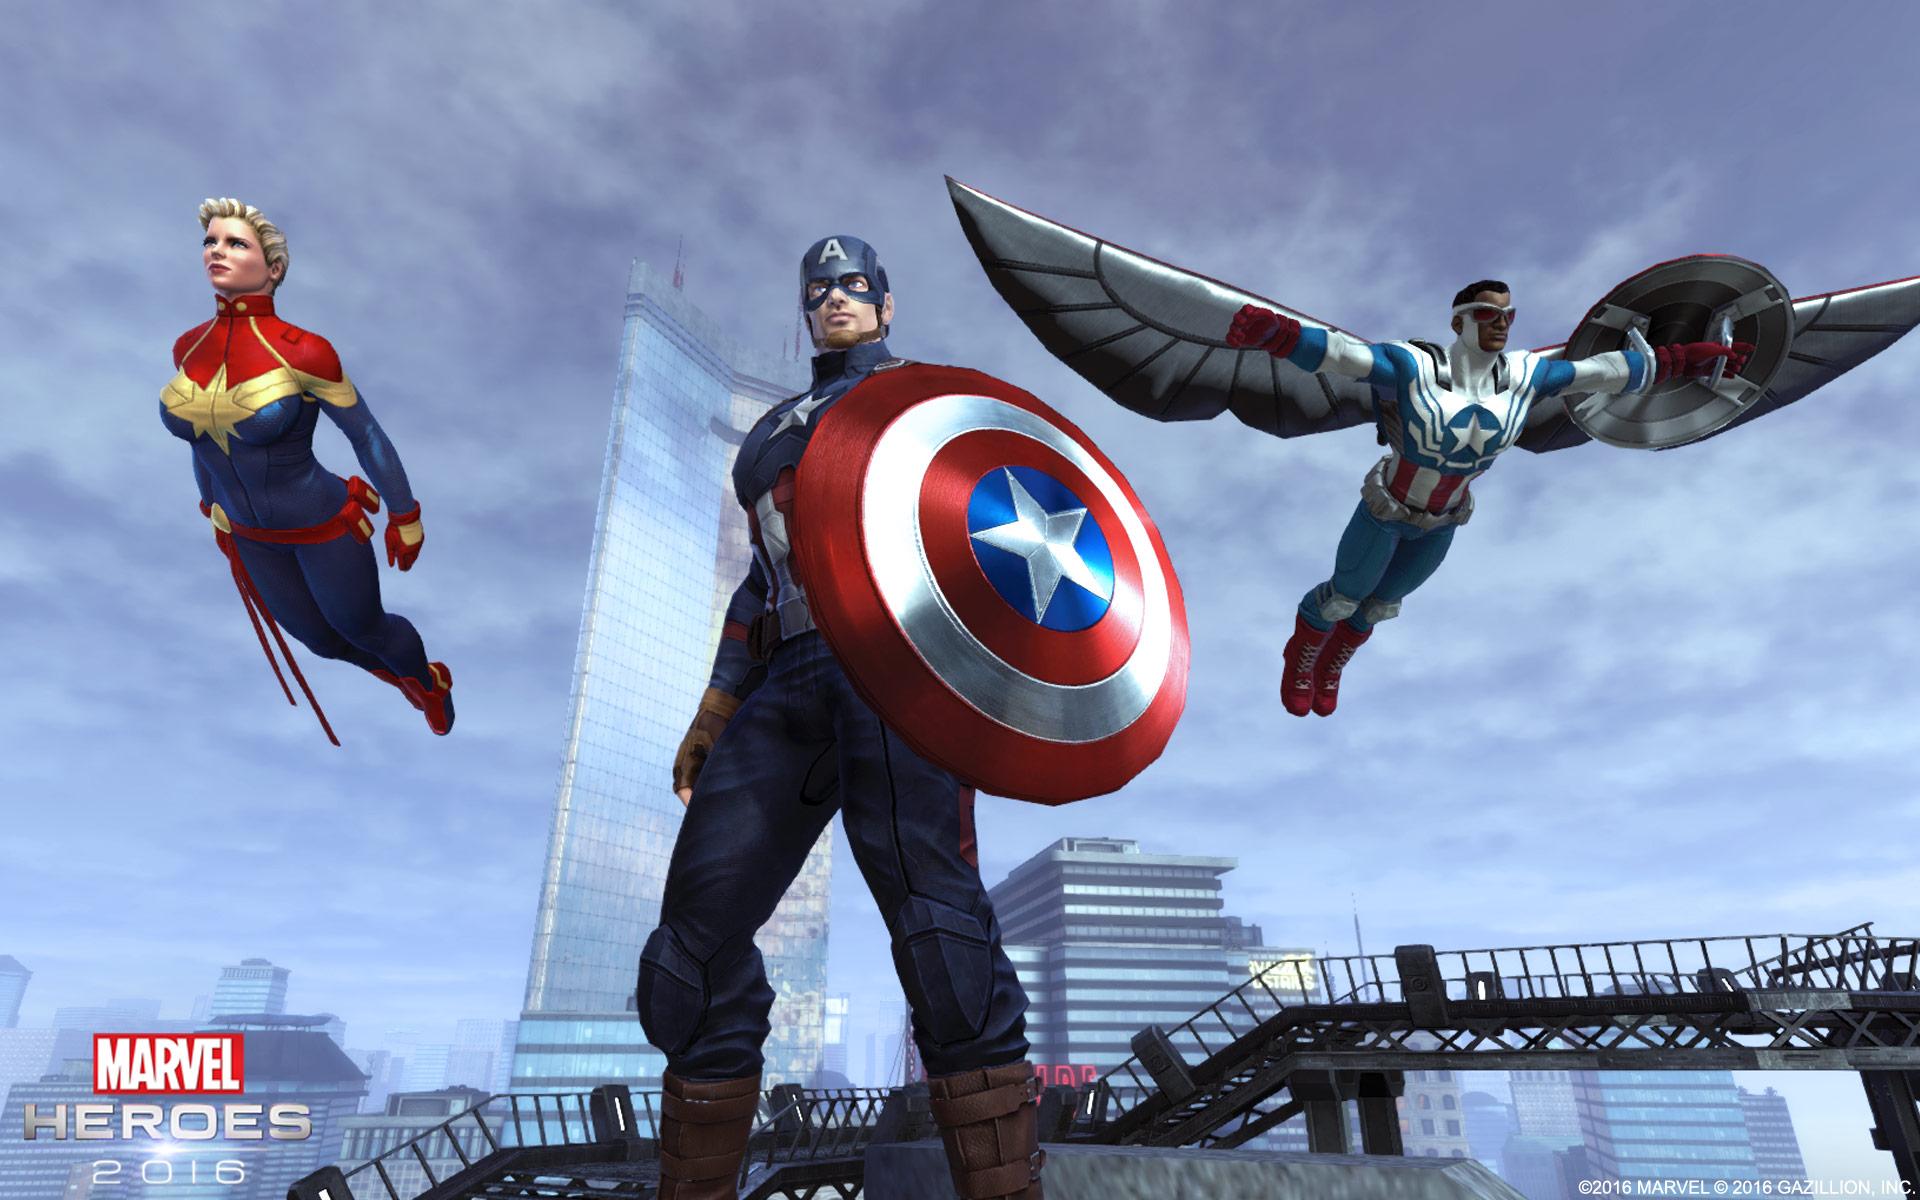 Marvel Heroes 2016 Celebrates Its Third Anniversary